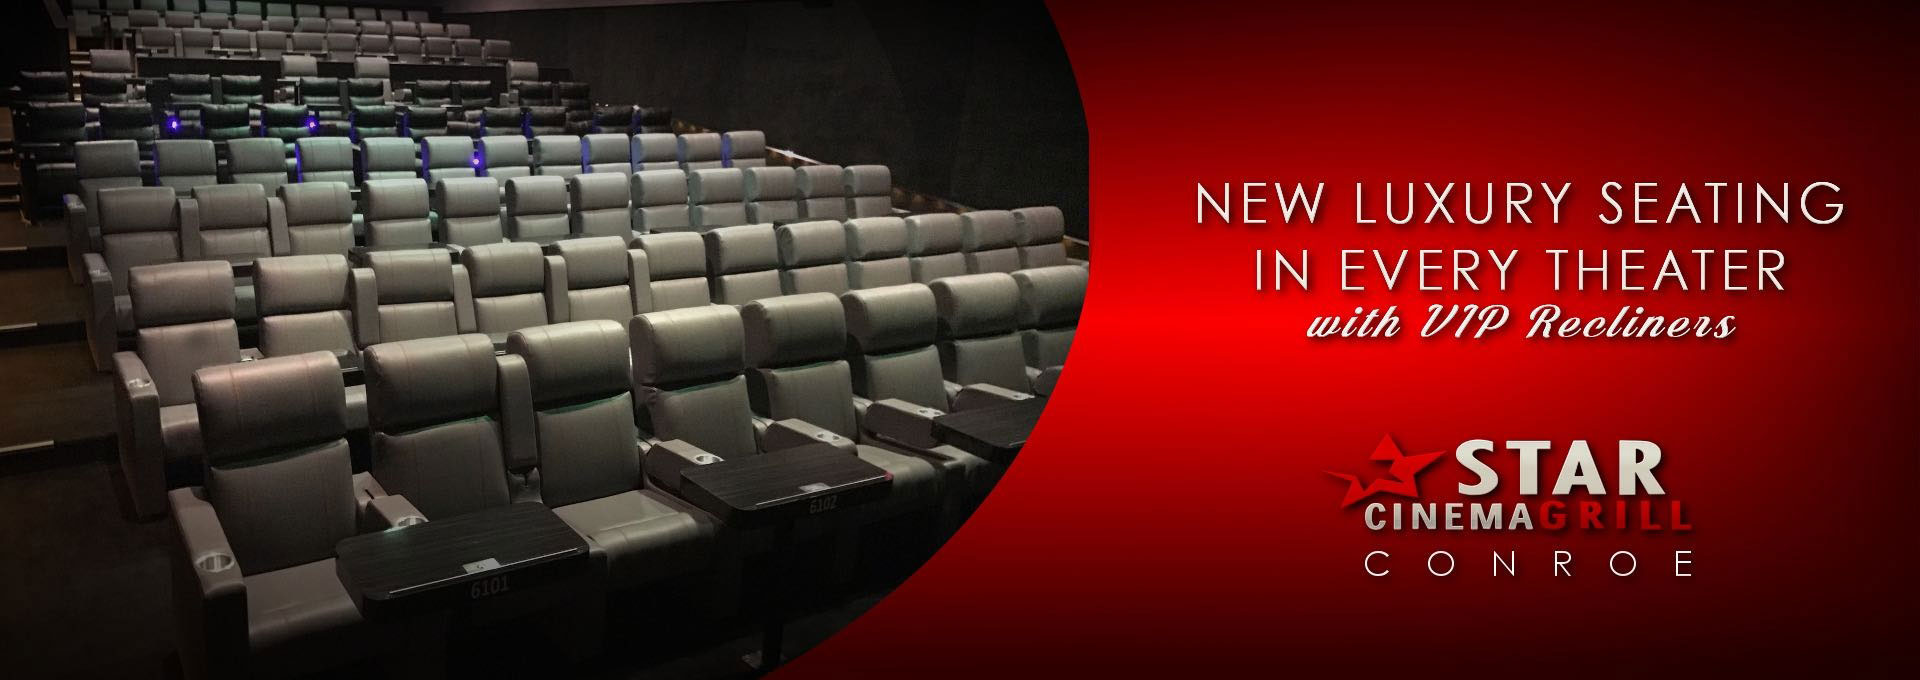 Conroe Seats image